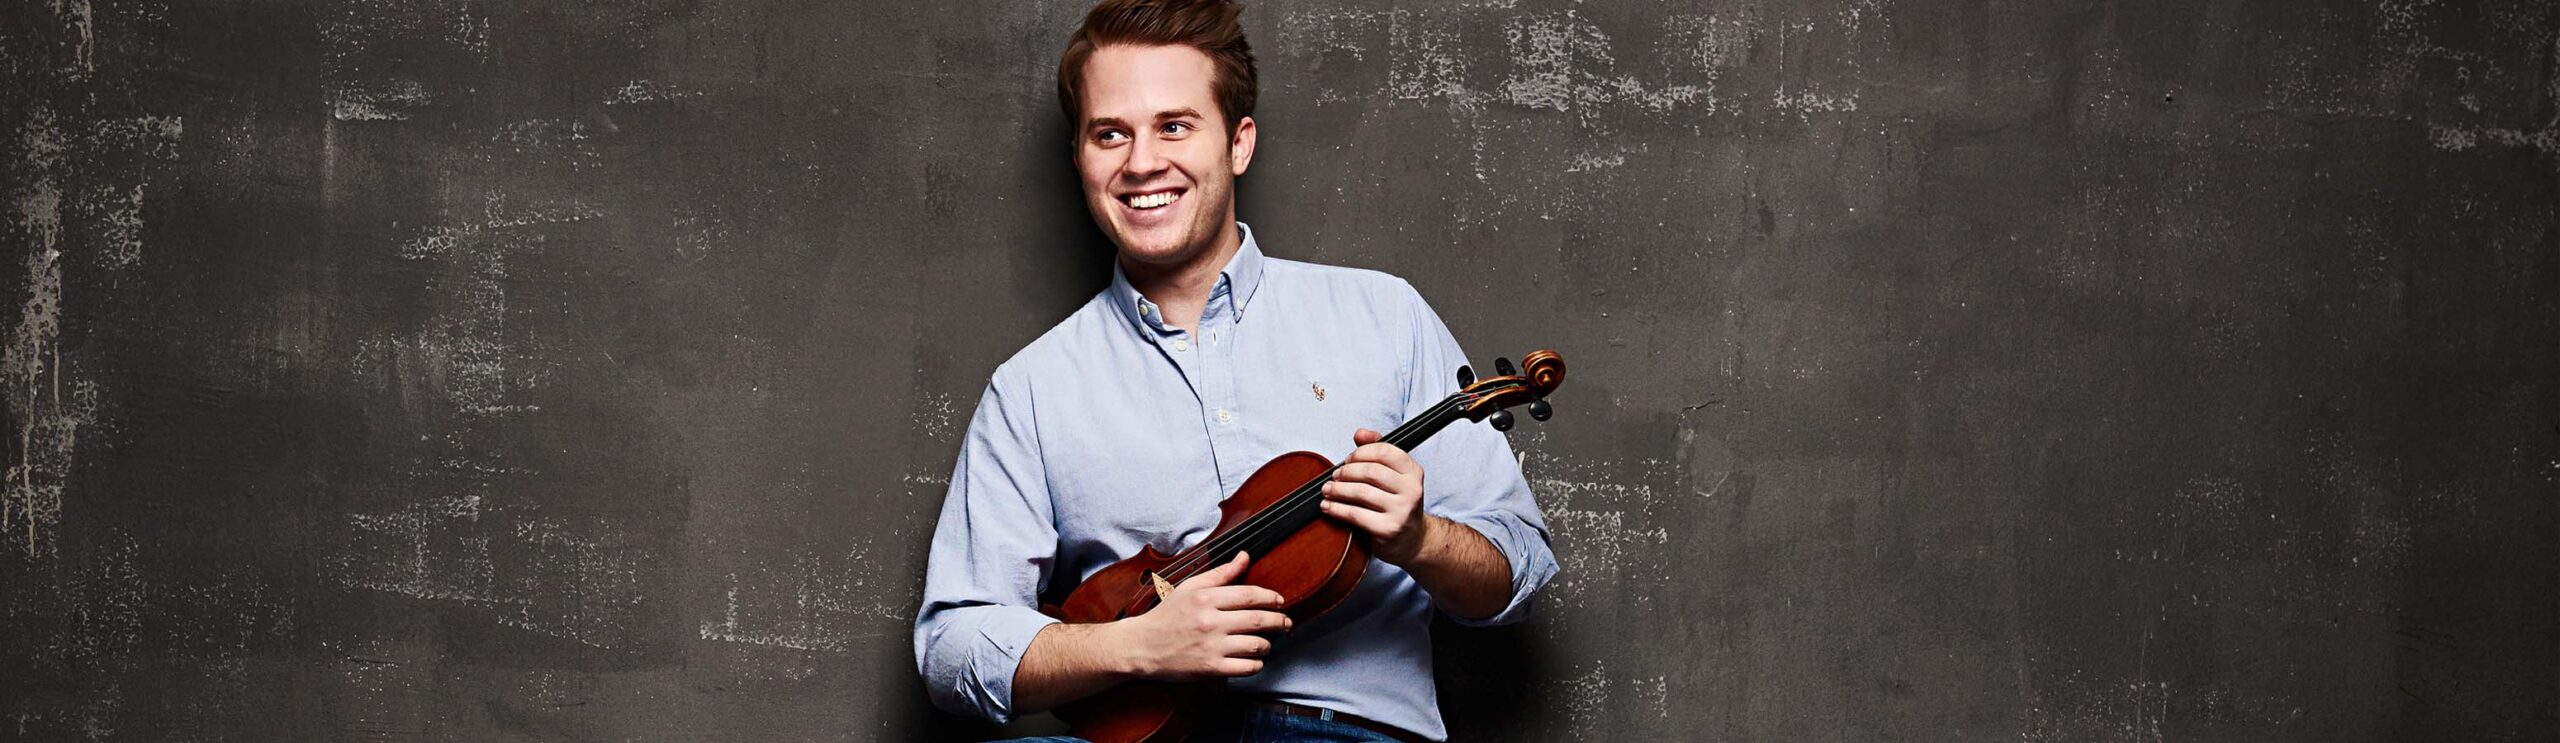 Tobias Feldmann, violinist